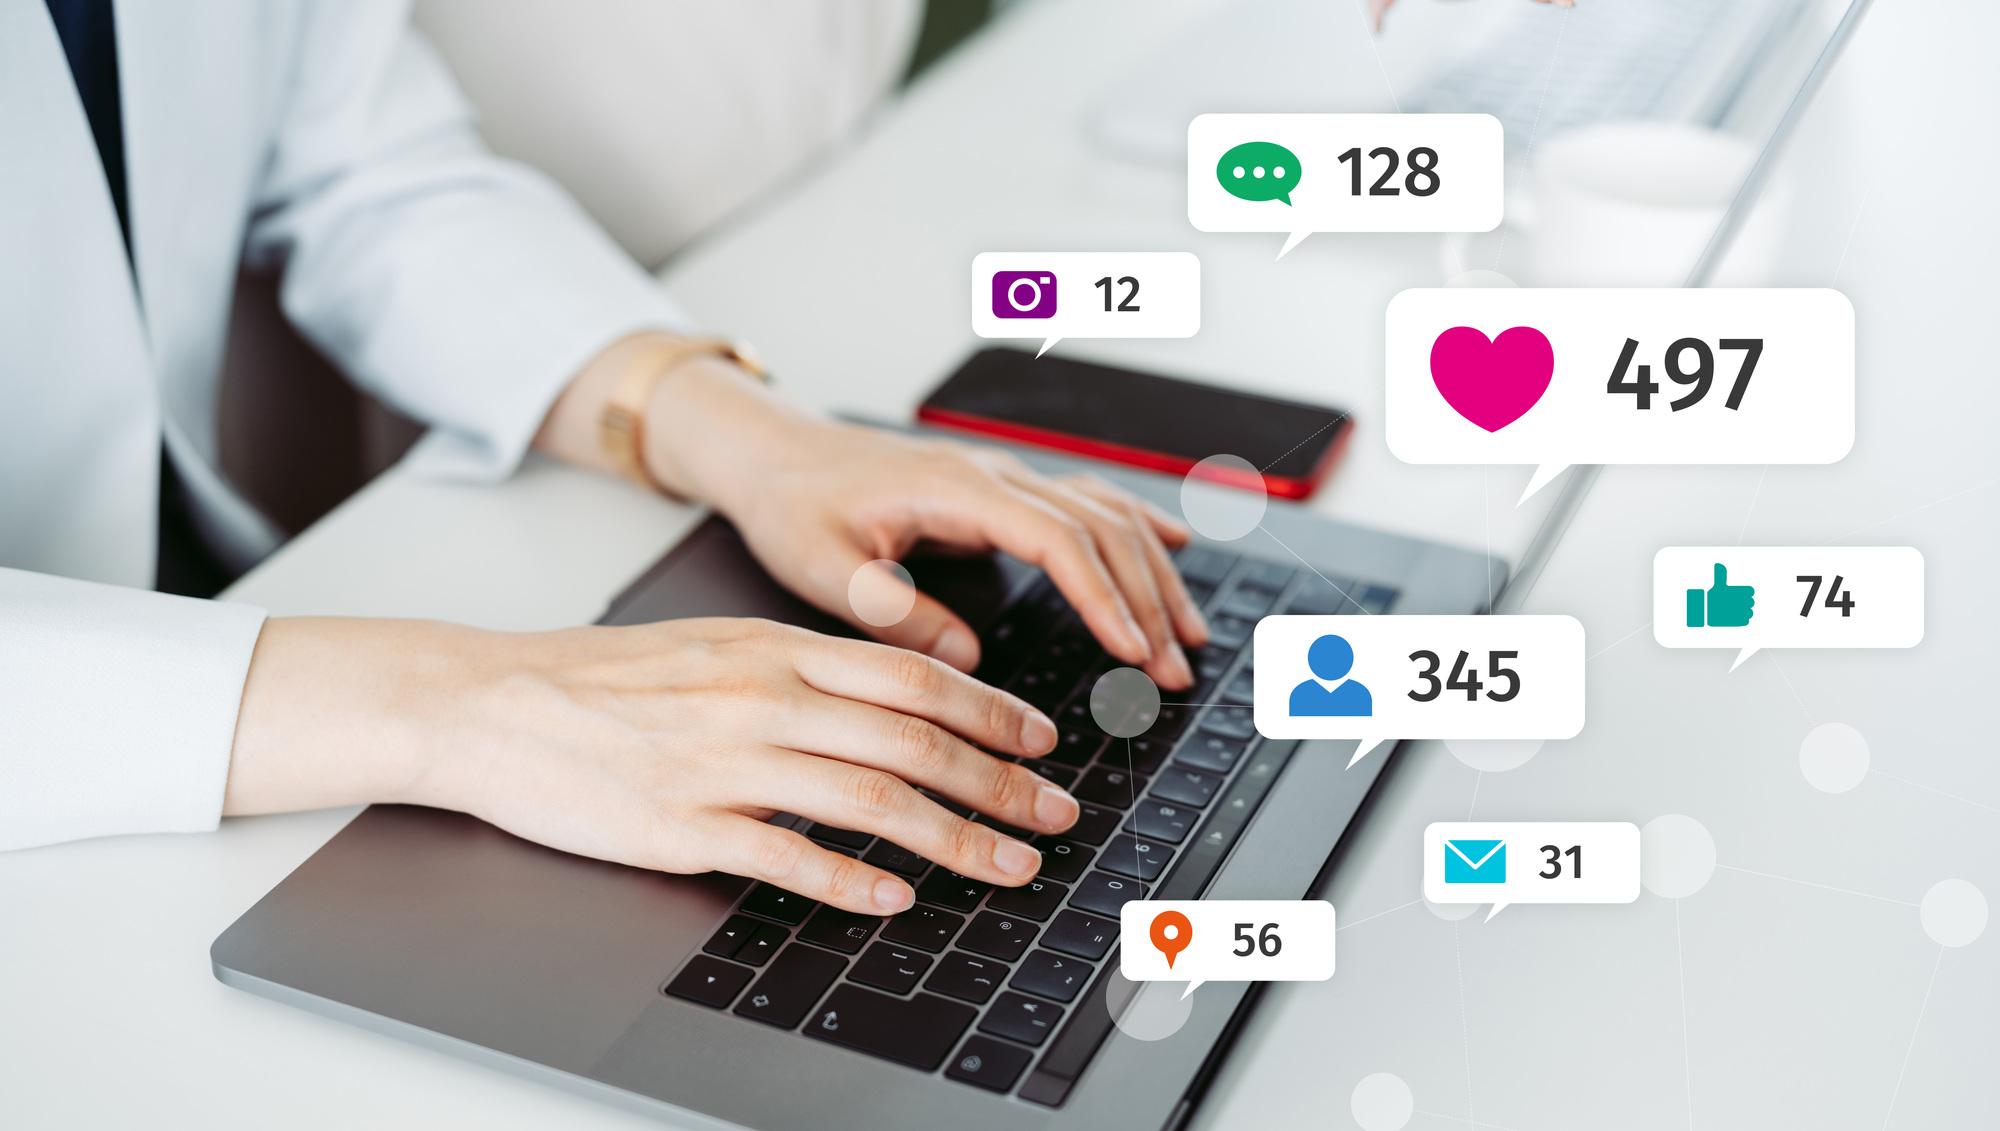 Facebook広告運用ガイド|仕組みや出稿方法、事例を解説